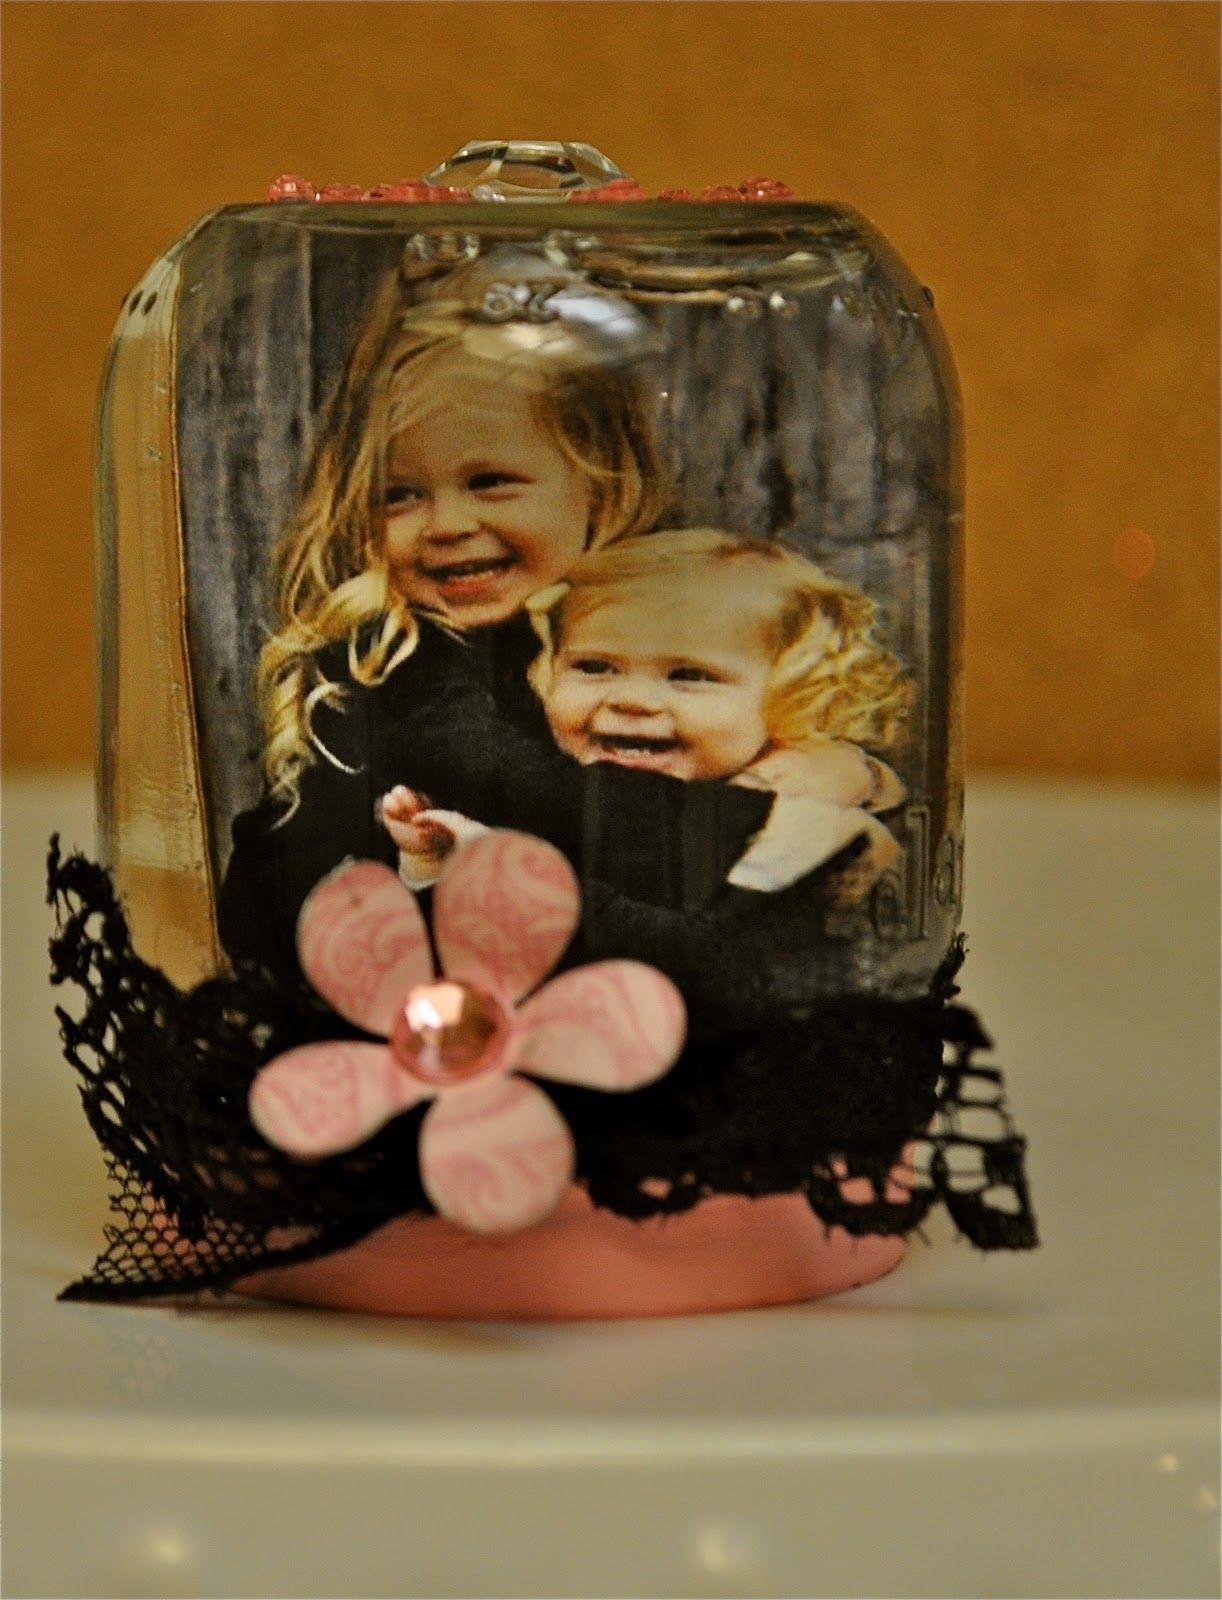 New Christmas Present Idea for my Mom and Gramma? :) Shhhh!